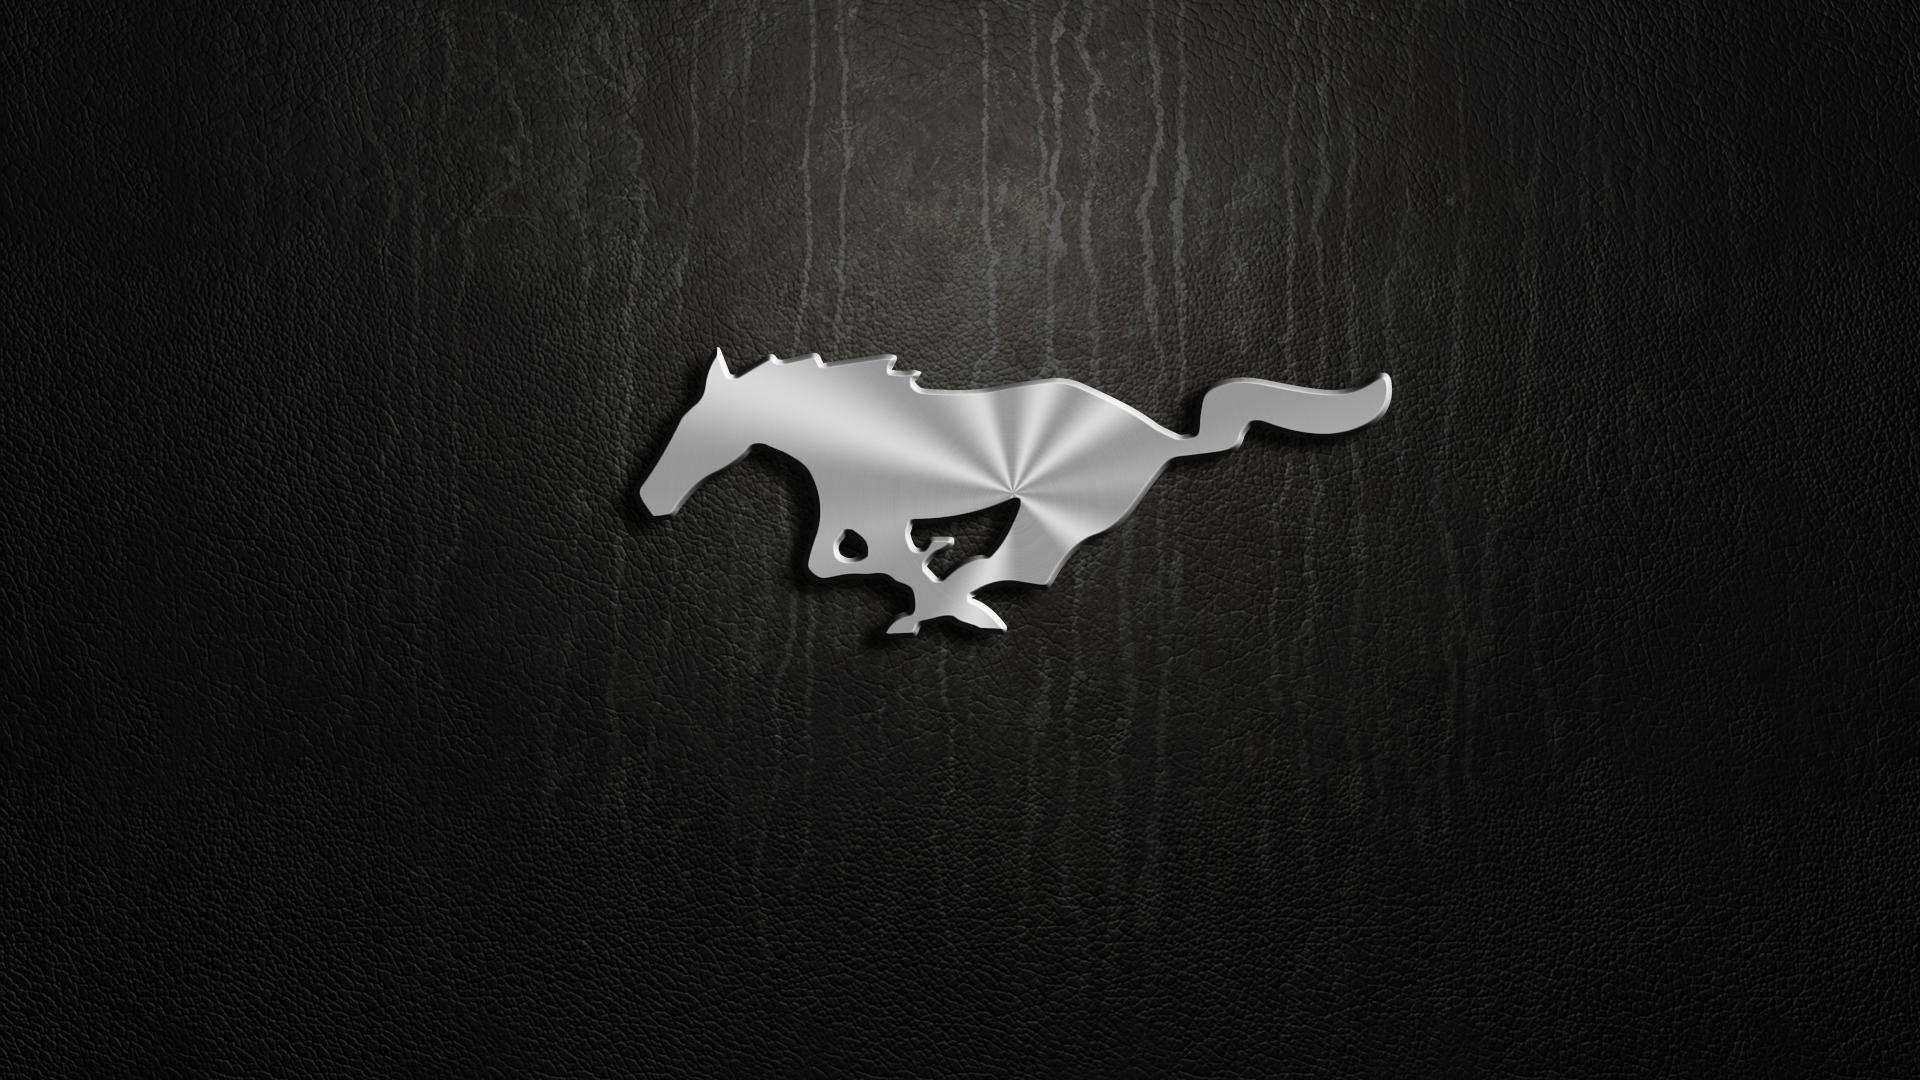 Ford Mustang Logo Wallpaper 20790